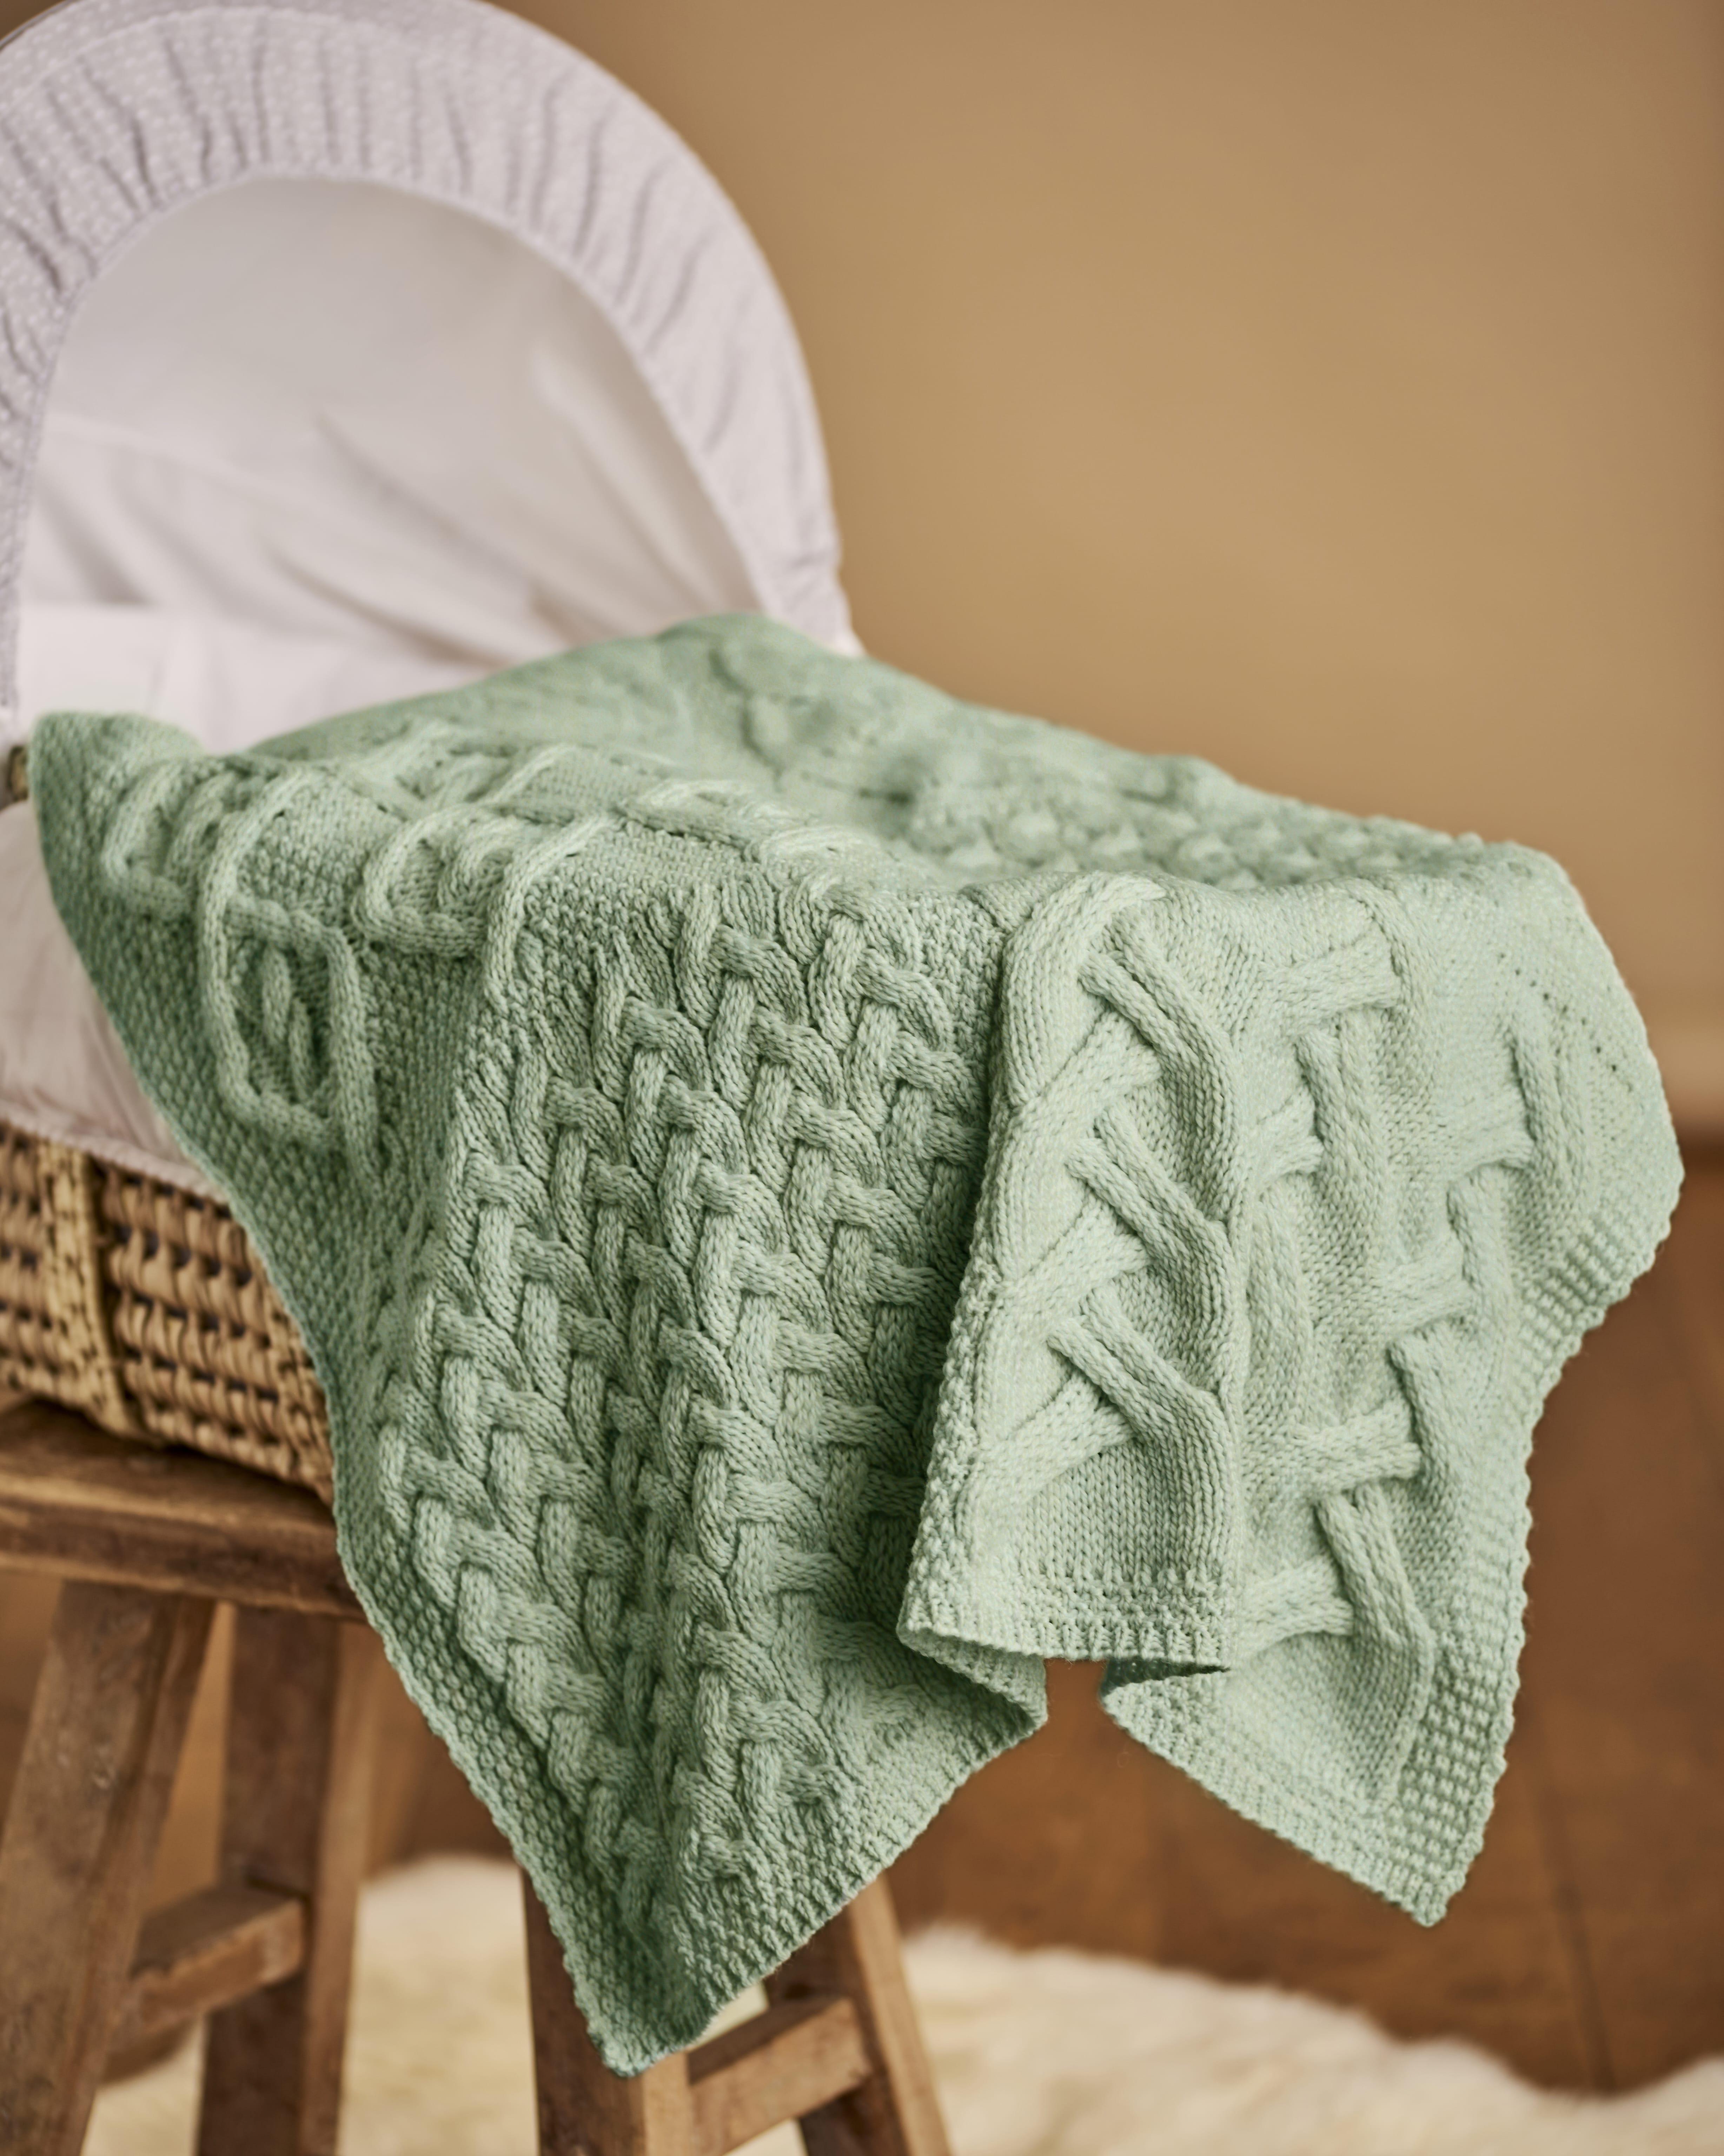 Supersoft Merino Cot Blanket